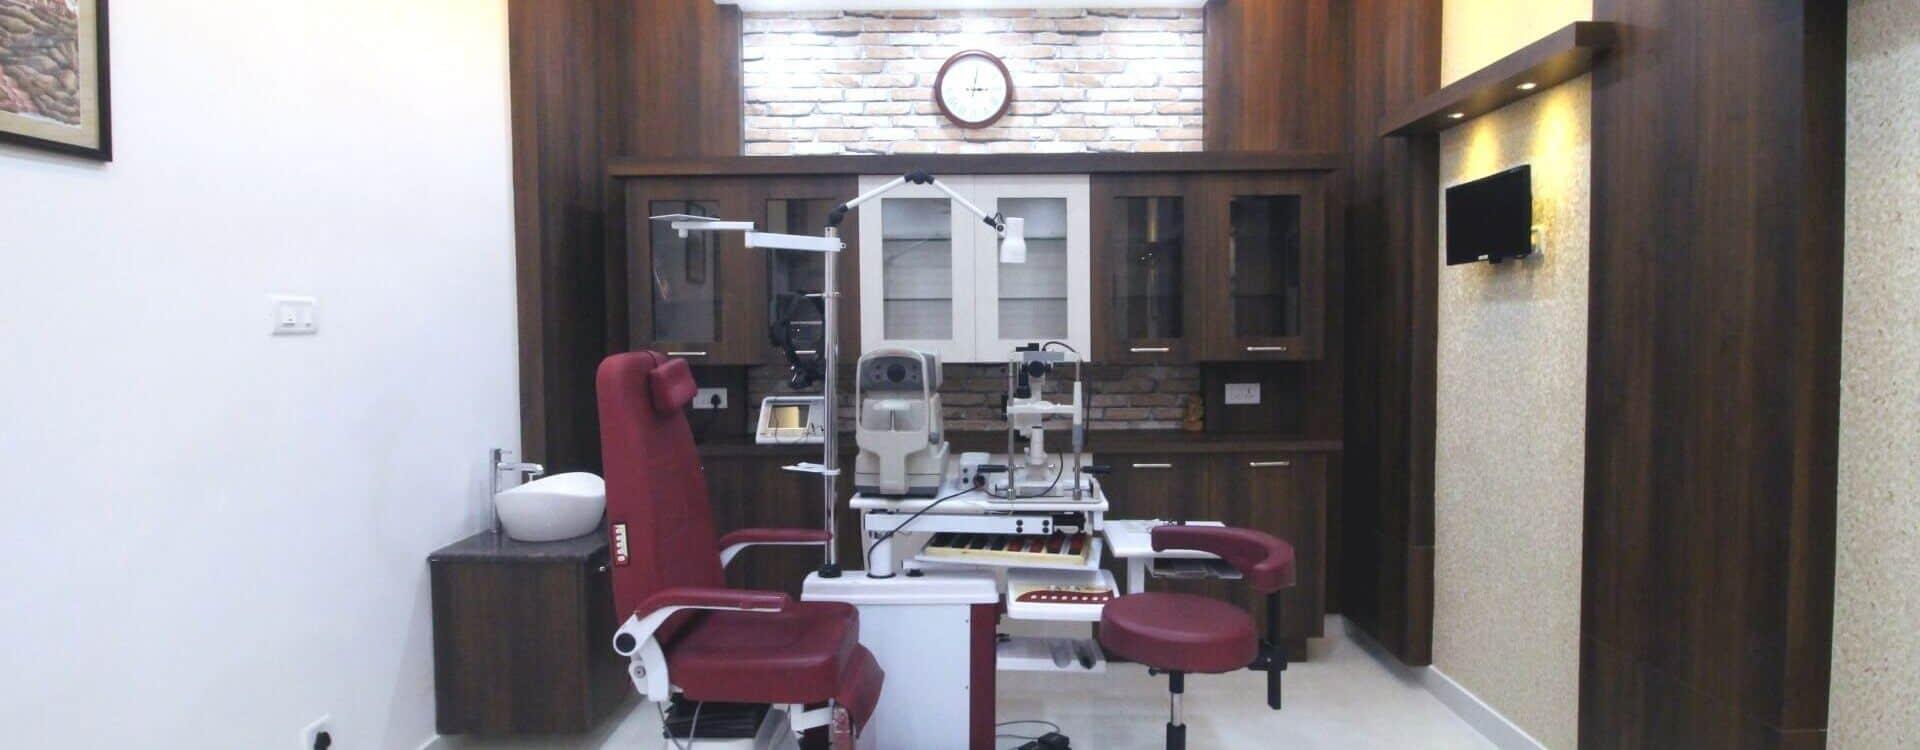 Dr. U. R Shenoy's - Prema Eye Clinic, Dongerkery, Mangaluru